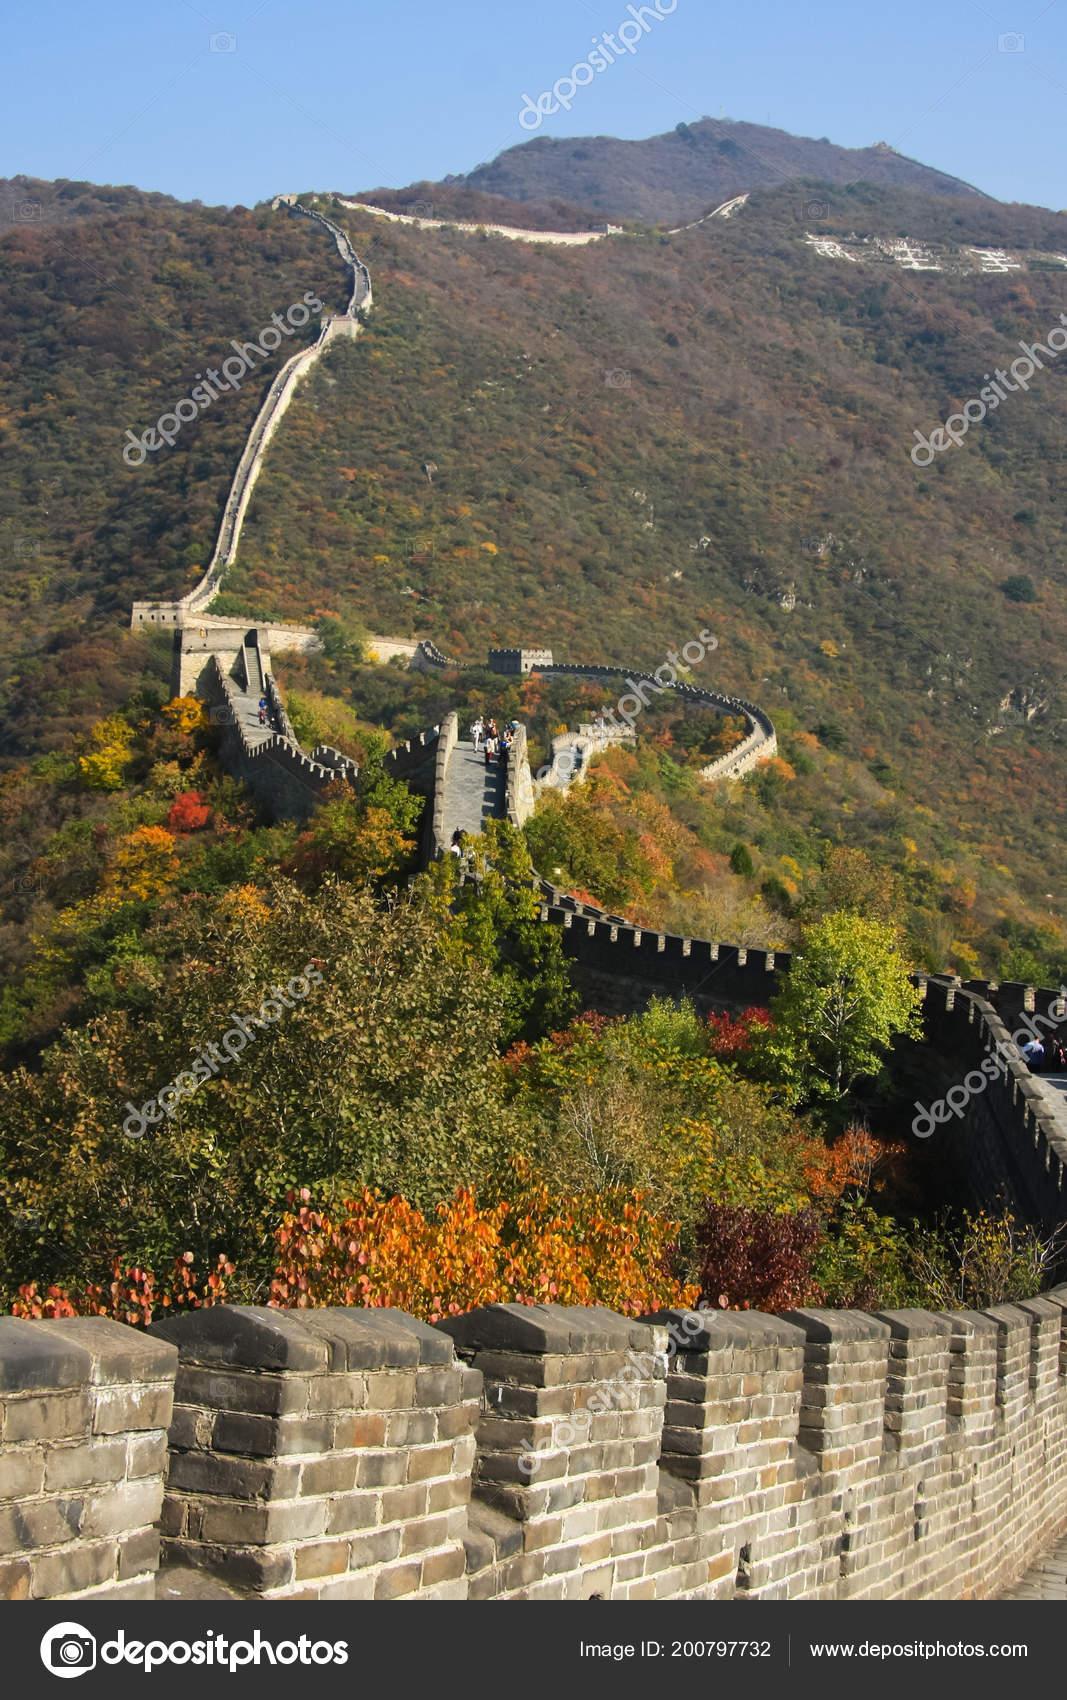 Grote Foto Op Muur.Grote Muur Herfst Muur Loopt Door Toppen Van Heuvels Bedekt